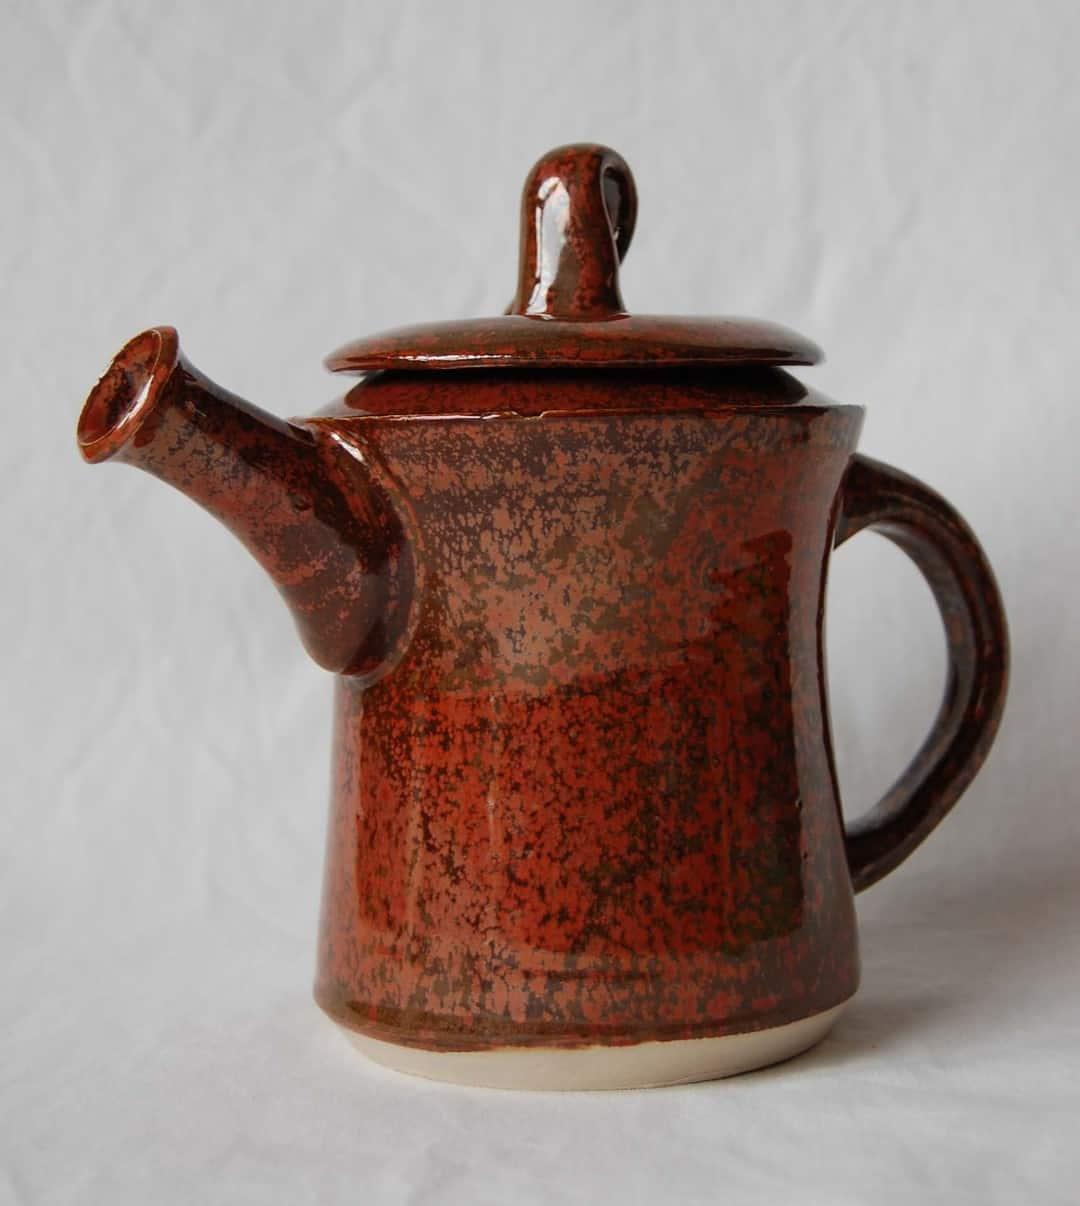 Teapot02_01 (Large)